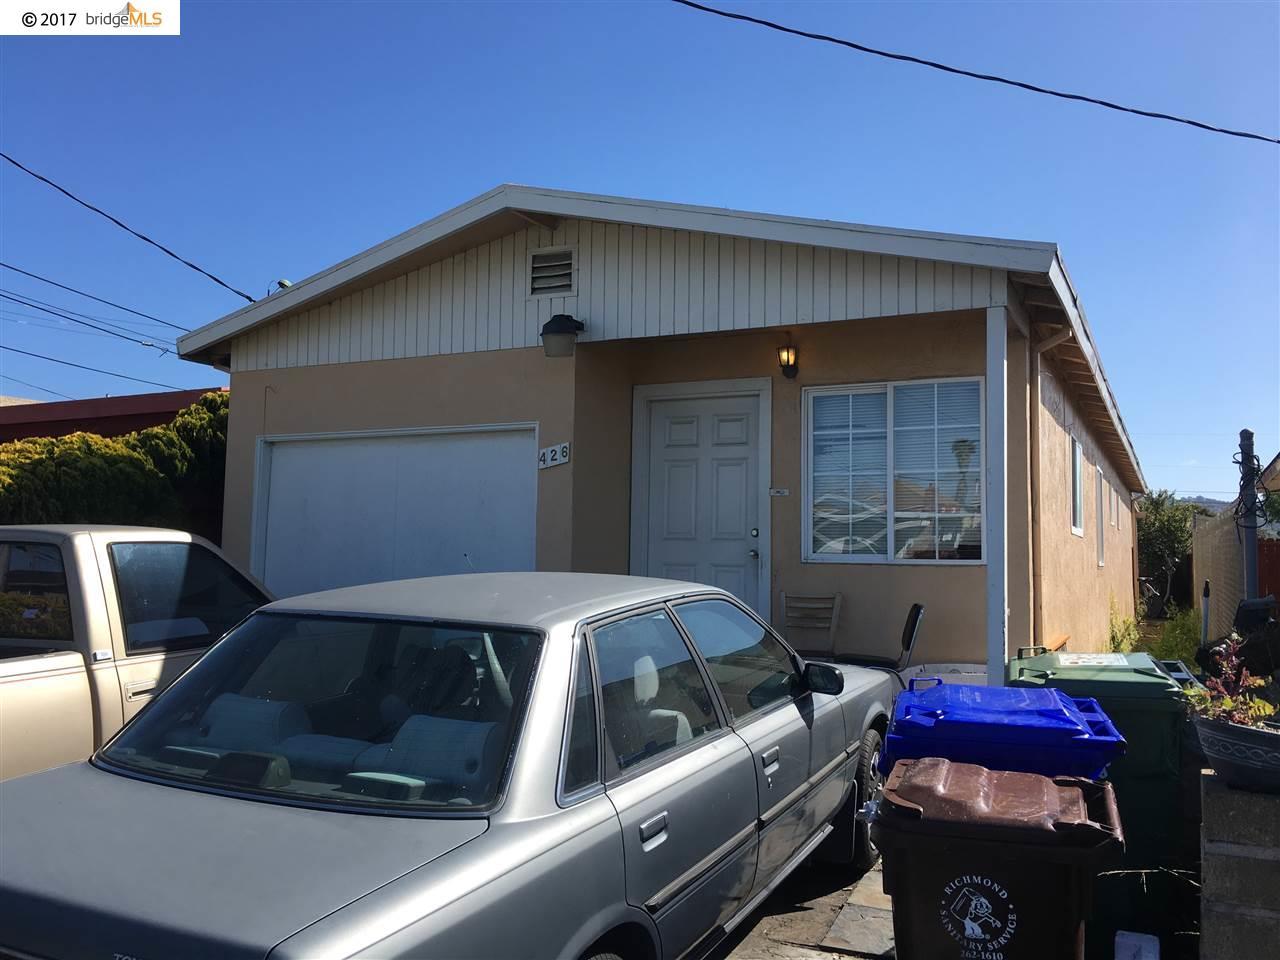 426 S 24TH ST, RICHMOND, CA 94804